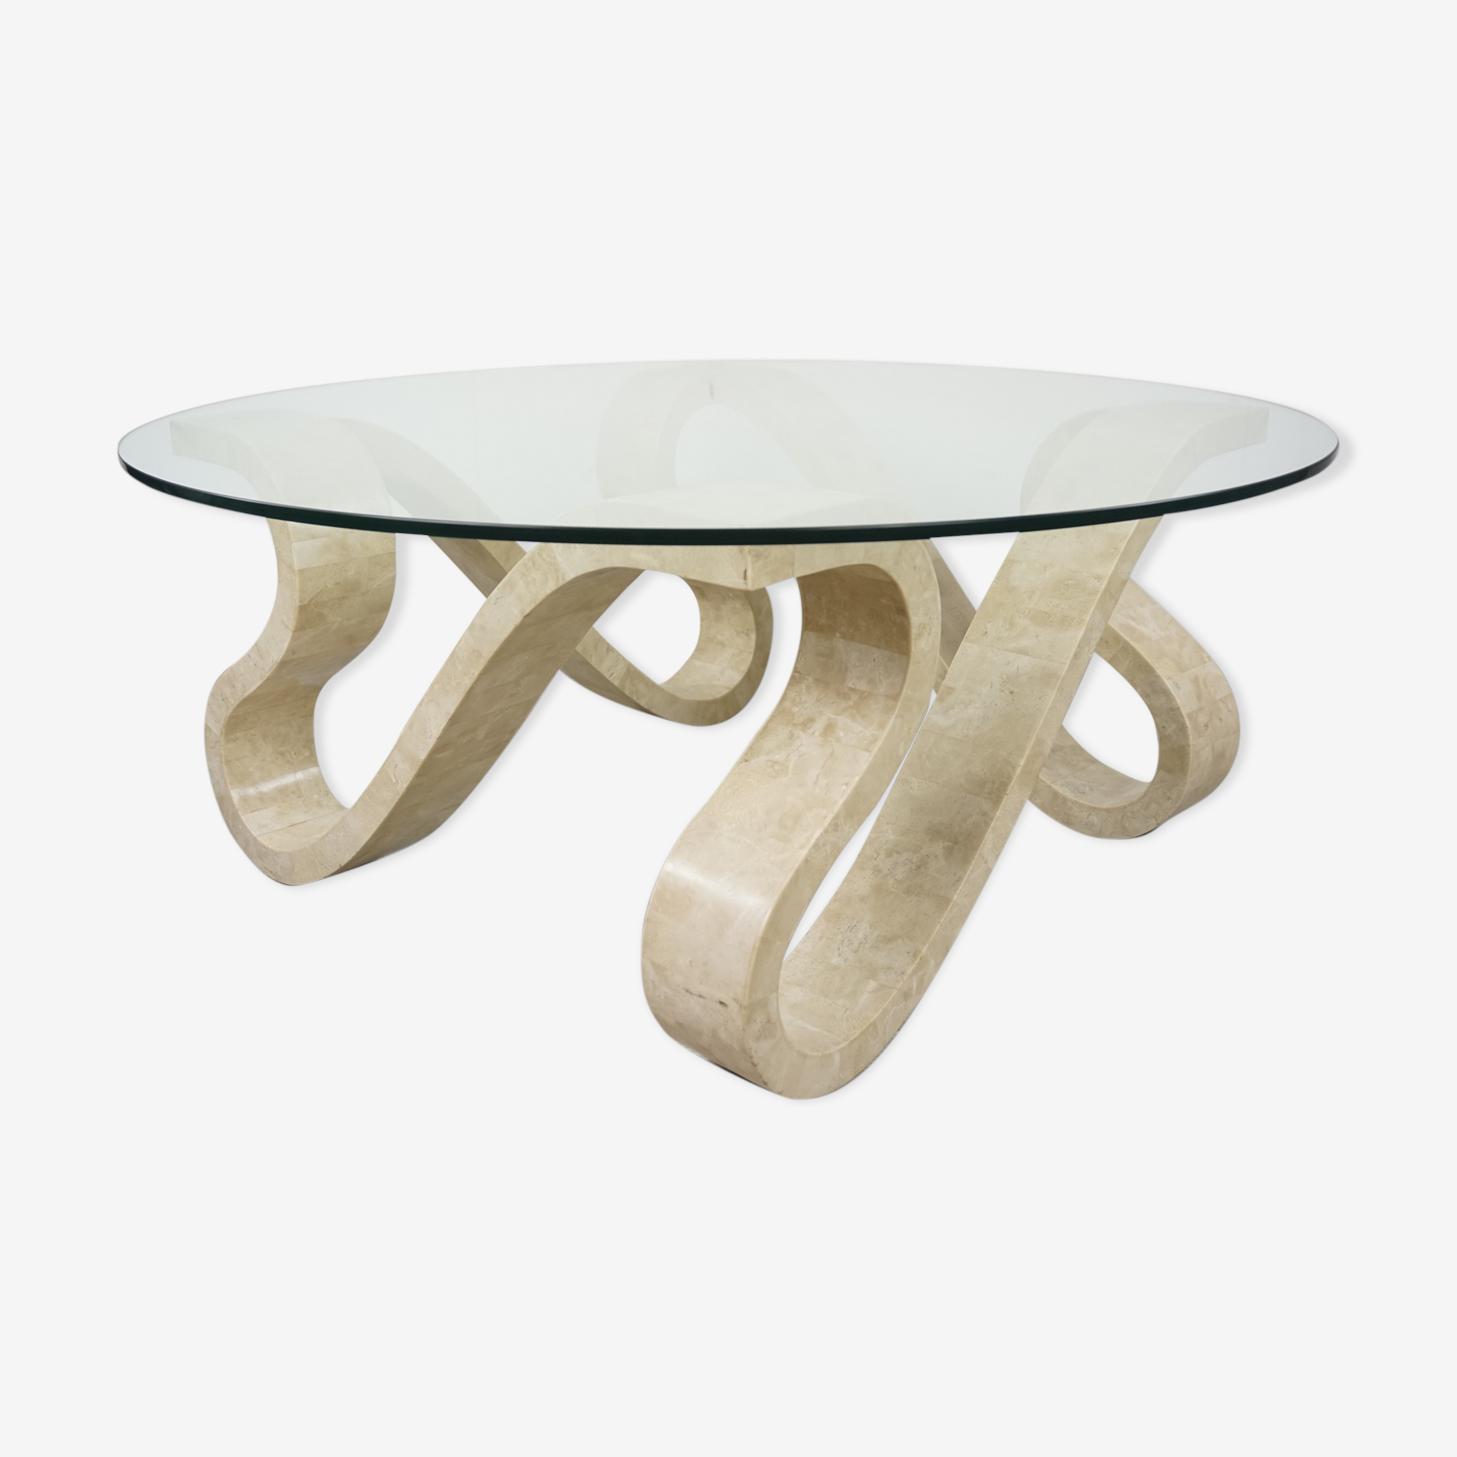 Table basse Ruban années 70